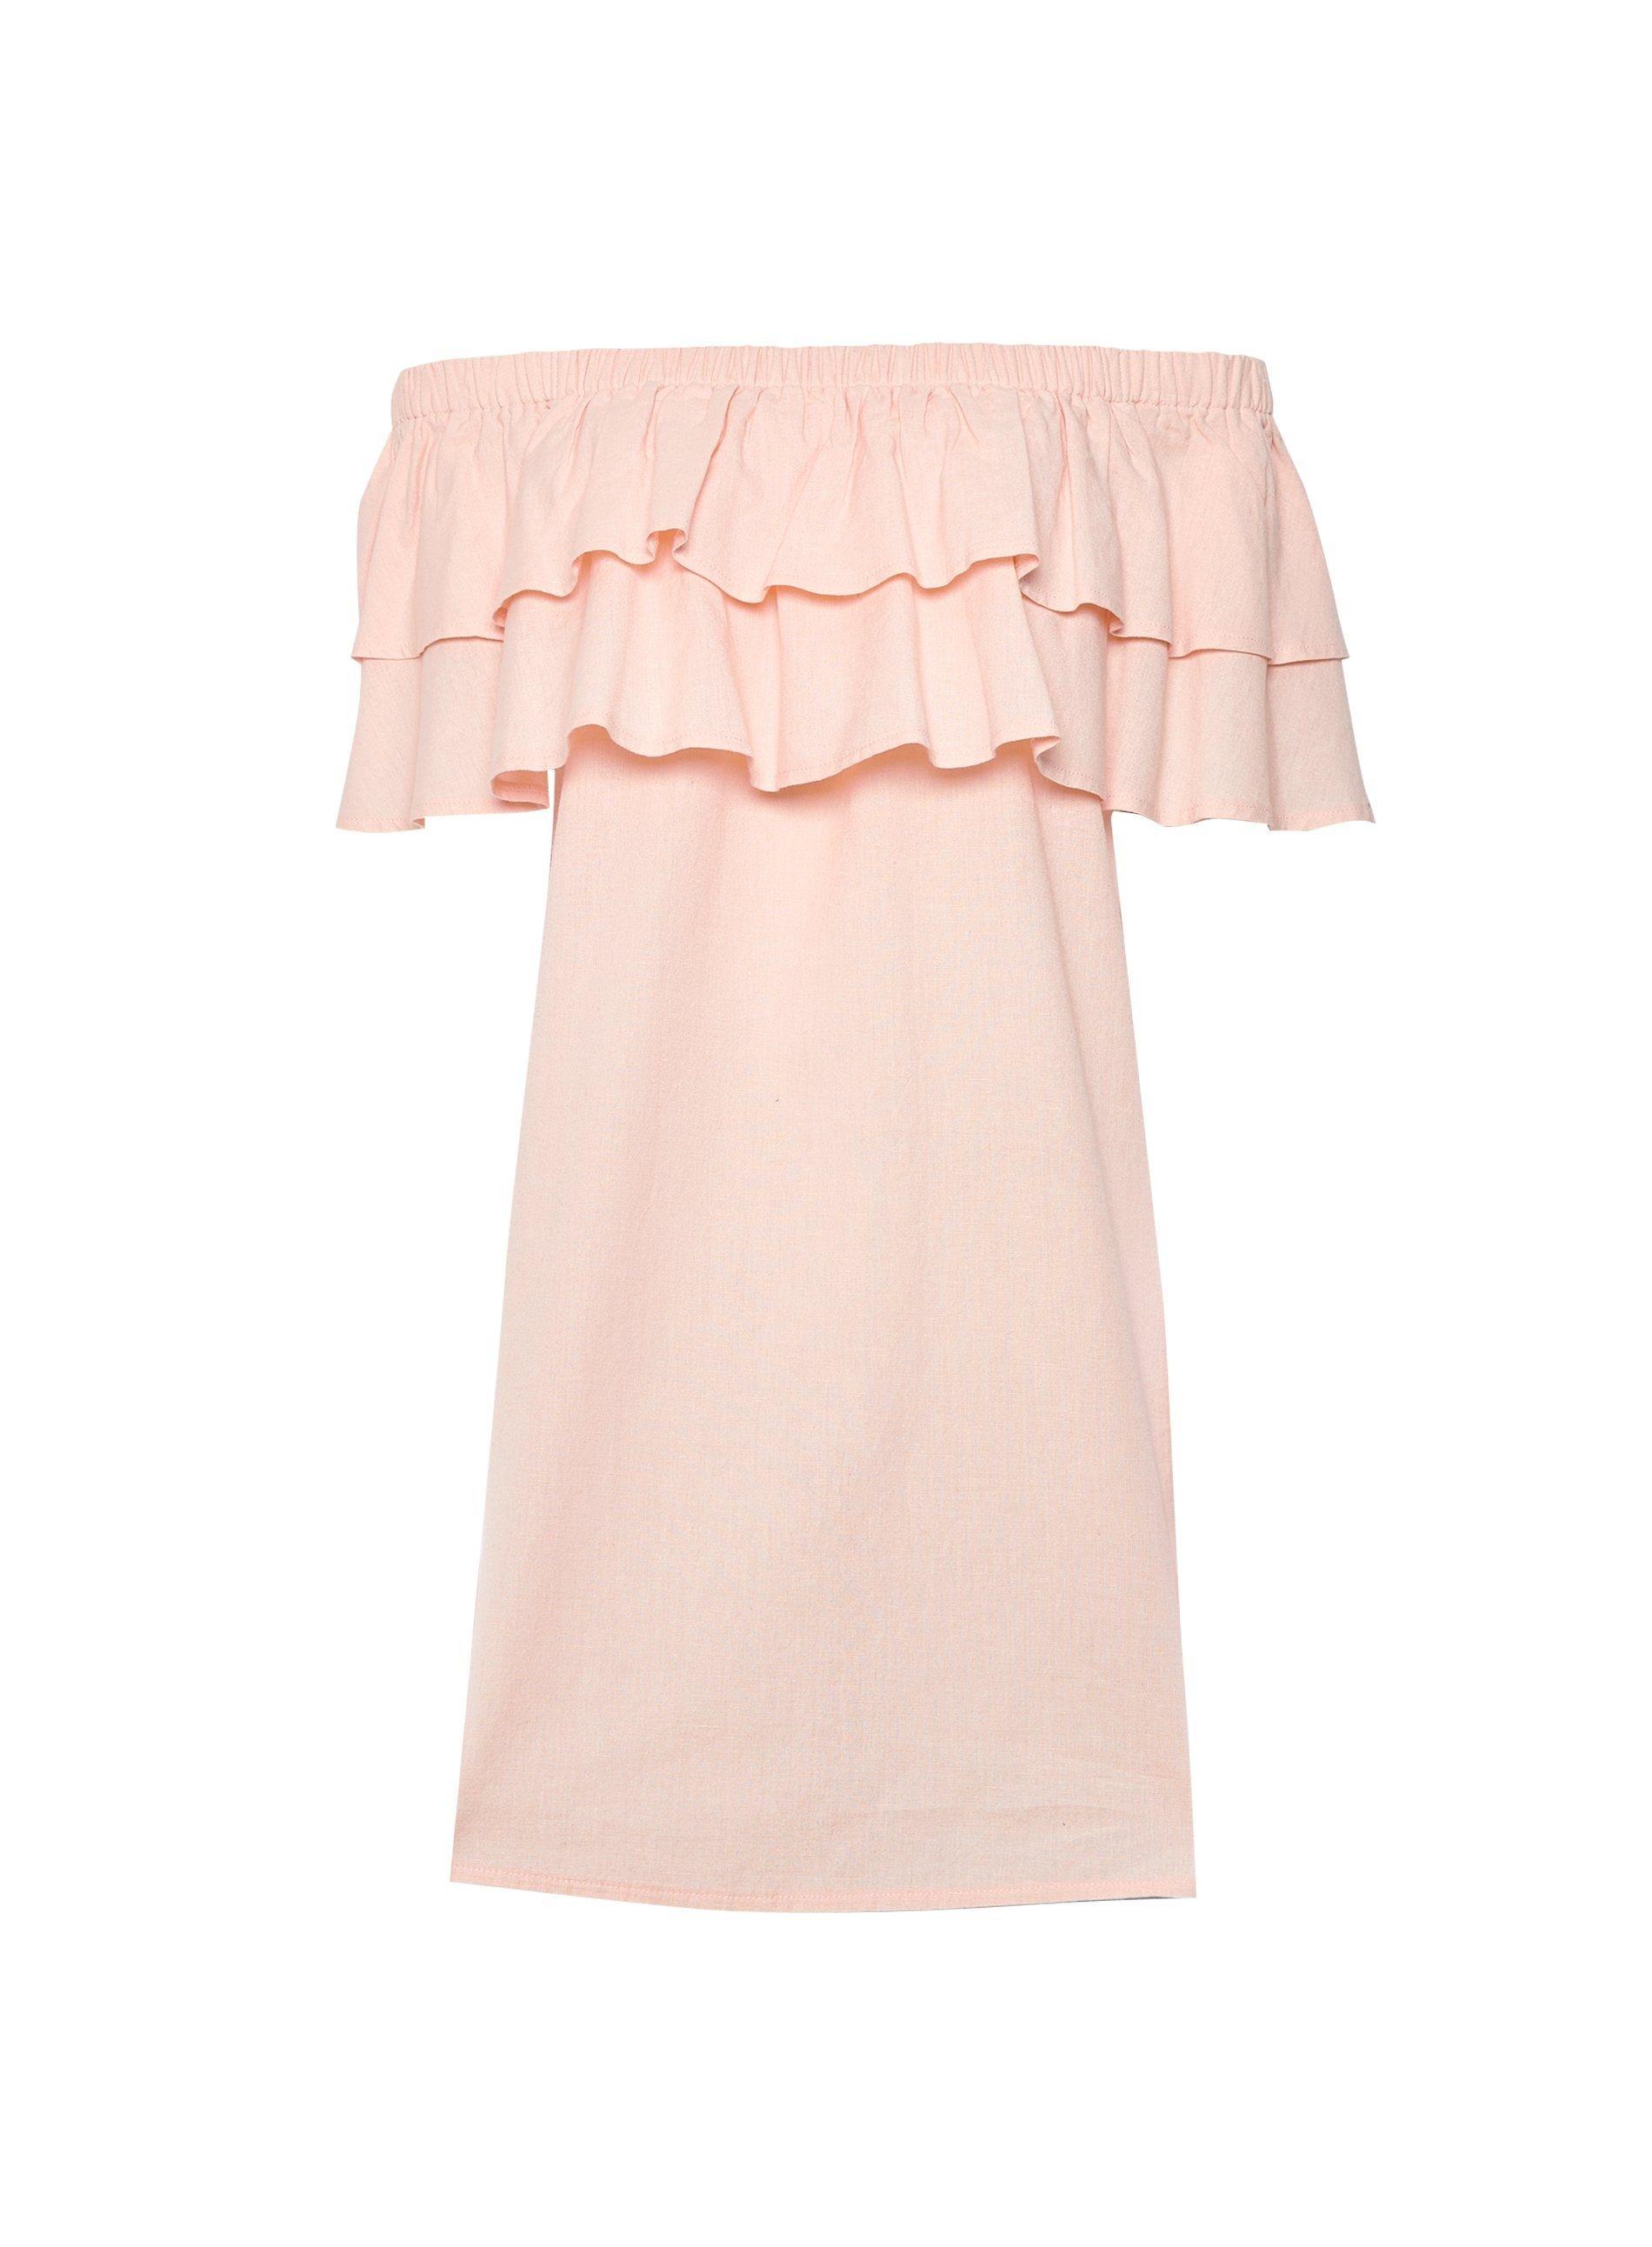 Dorothy Perkins Womens Pink Double Frill Bardot Mini Dress Shoulderless